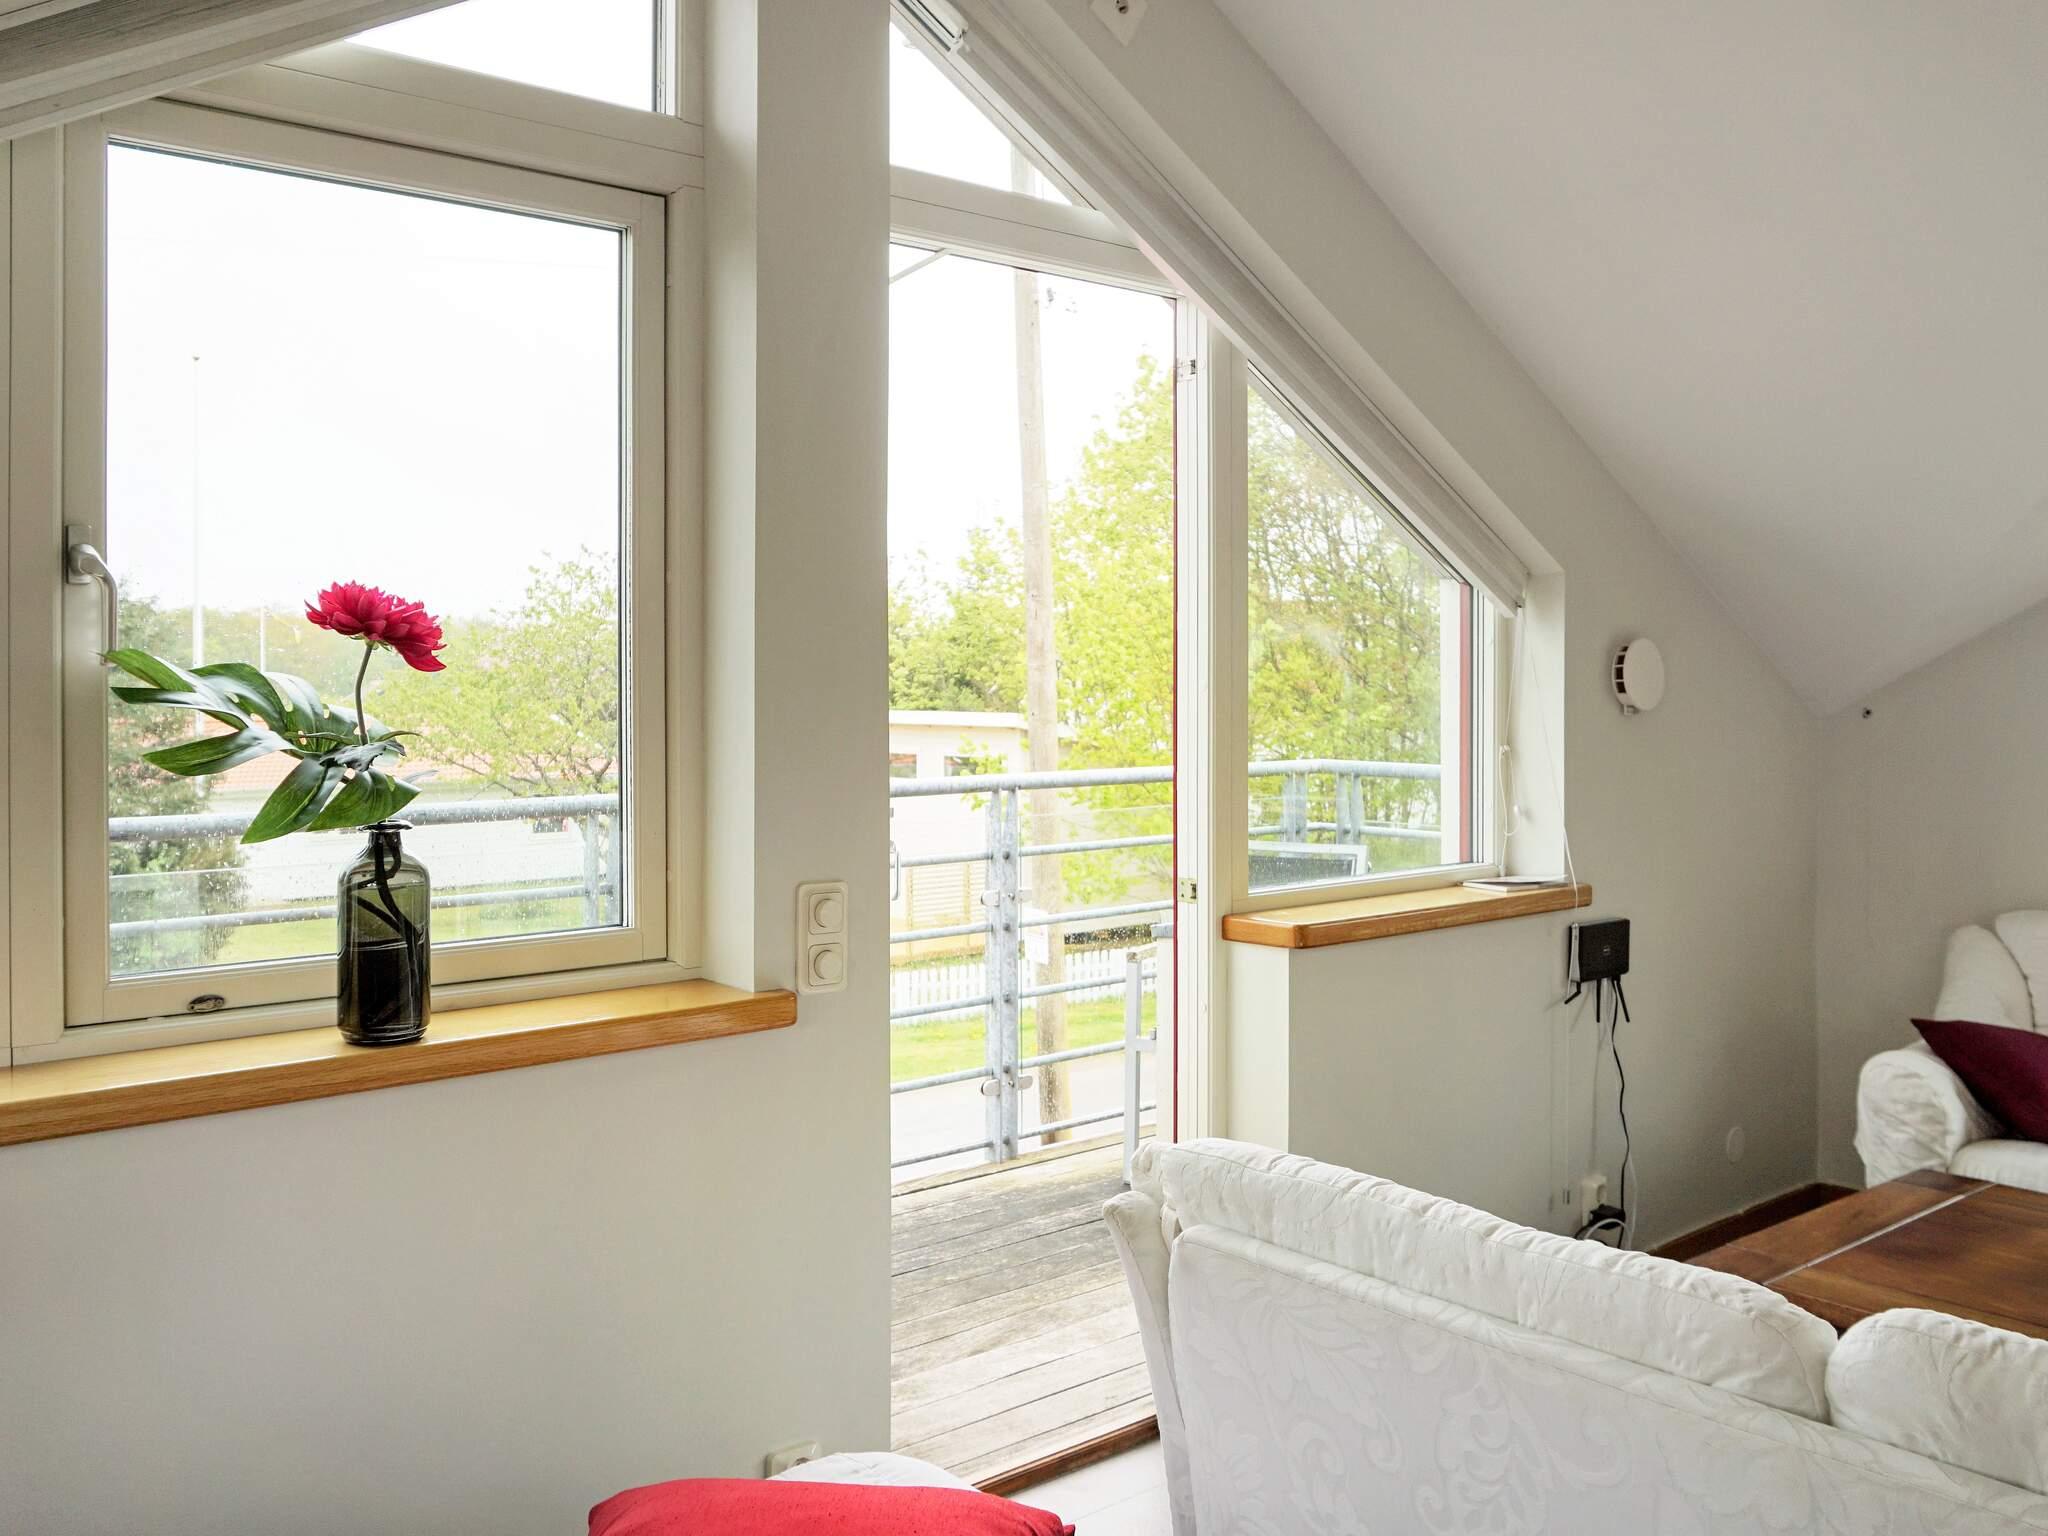 Ferienhaus Onsala (2619121), Onsala, Hallands län, Südschweden, Schweden, Bild 10